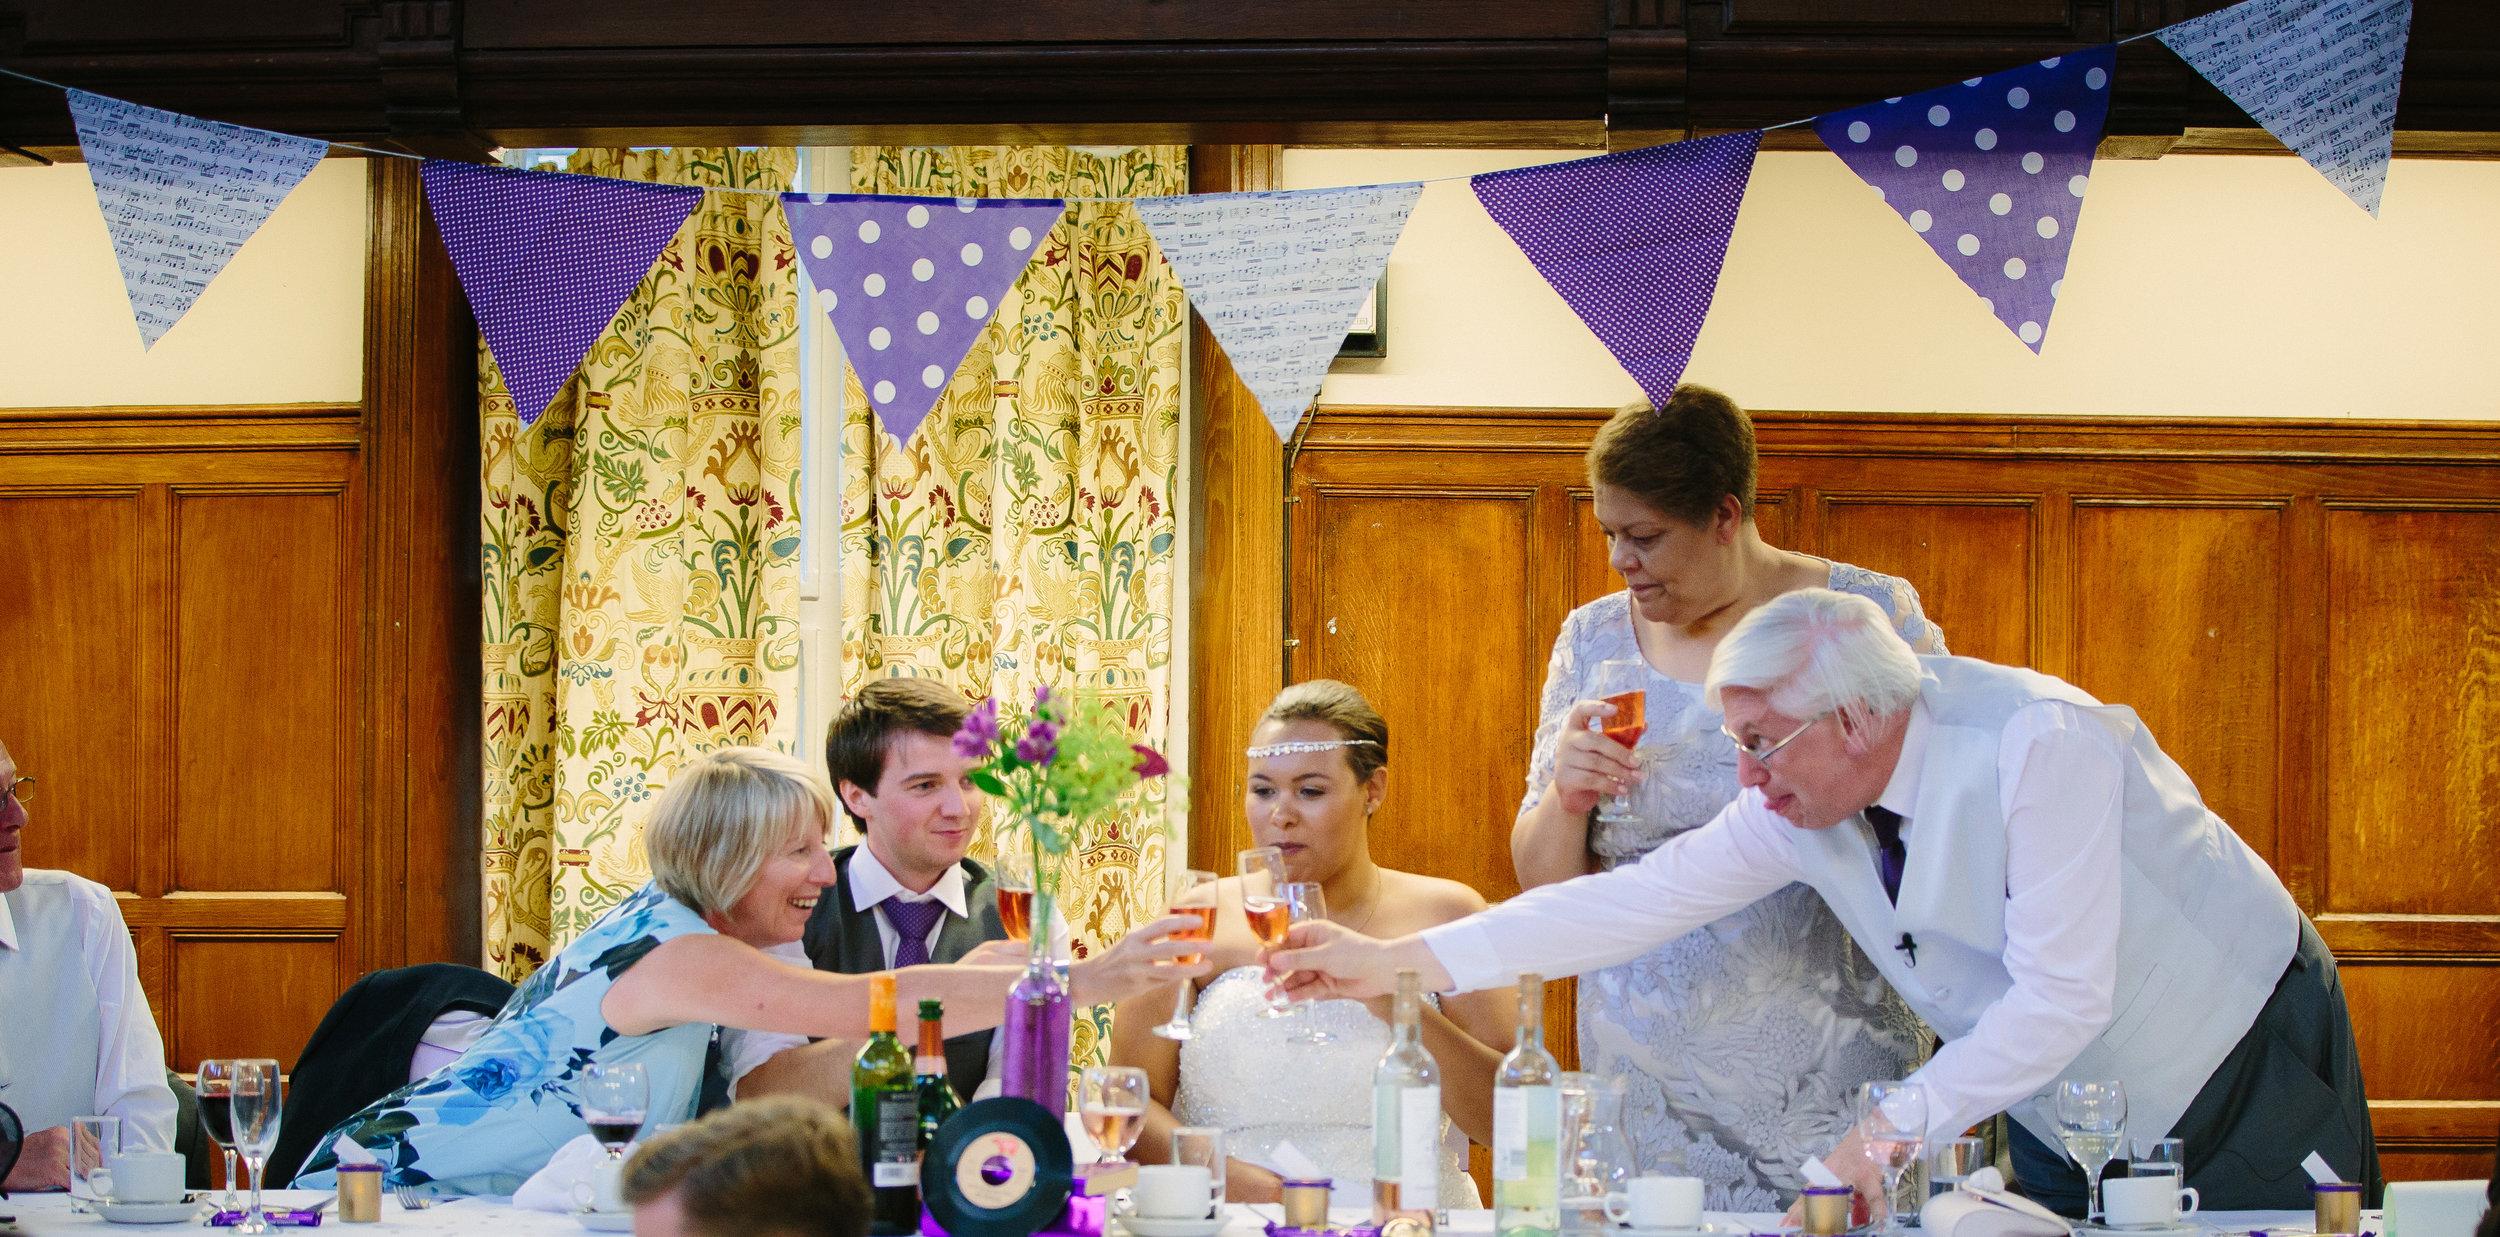 Saint-Alfege-Church-greenwich-wedding-charlton-house-reception-260